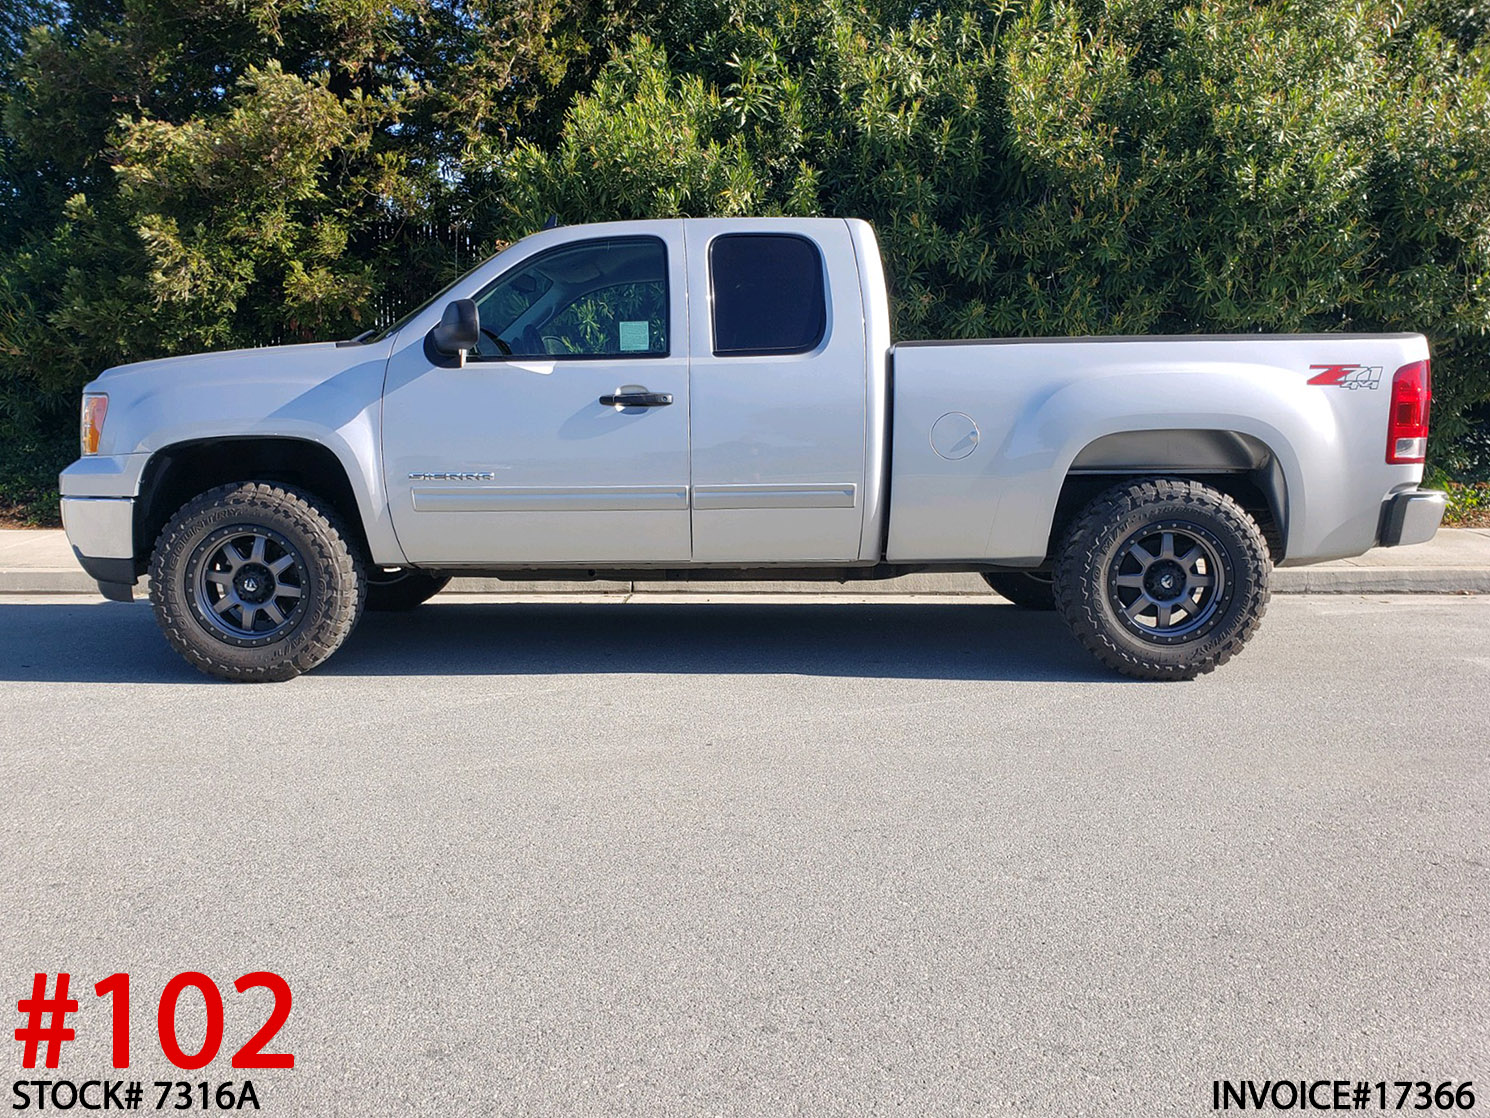 USED 2012 GMC 1500 CREW CAB #7316A